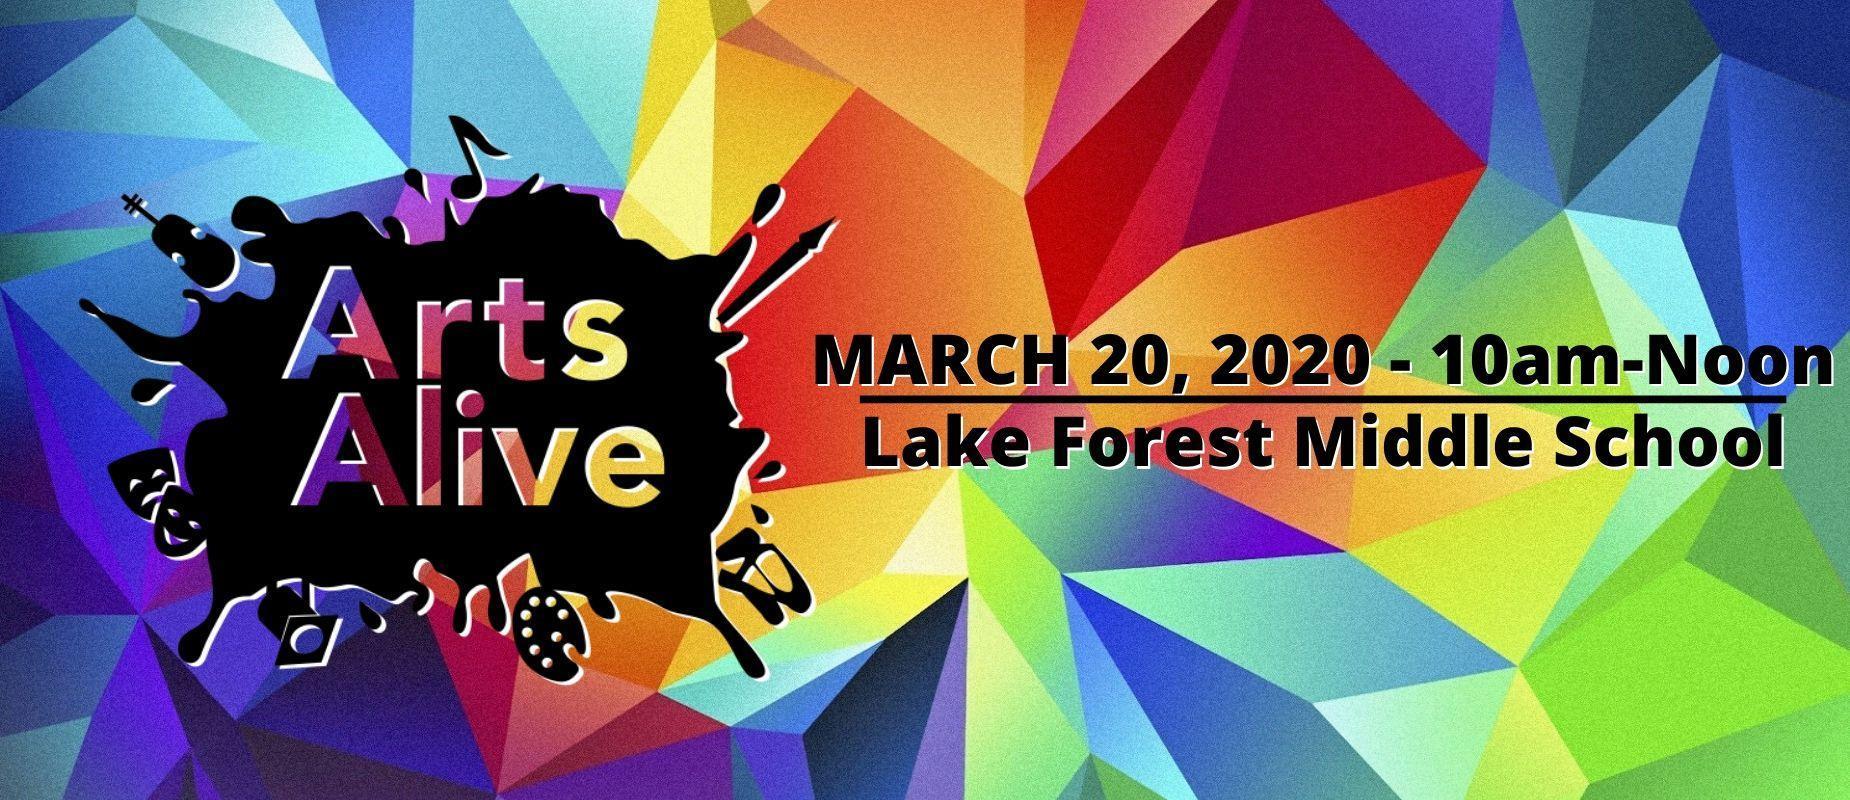 Arts Alive - March 20, 2020 - LFMS